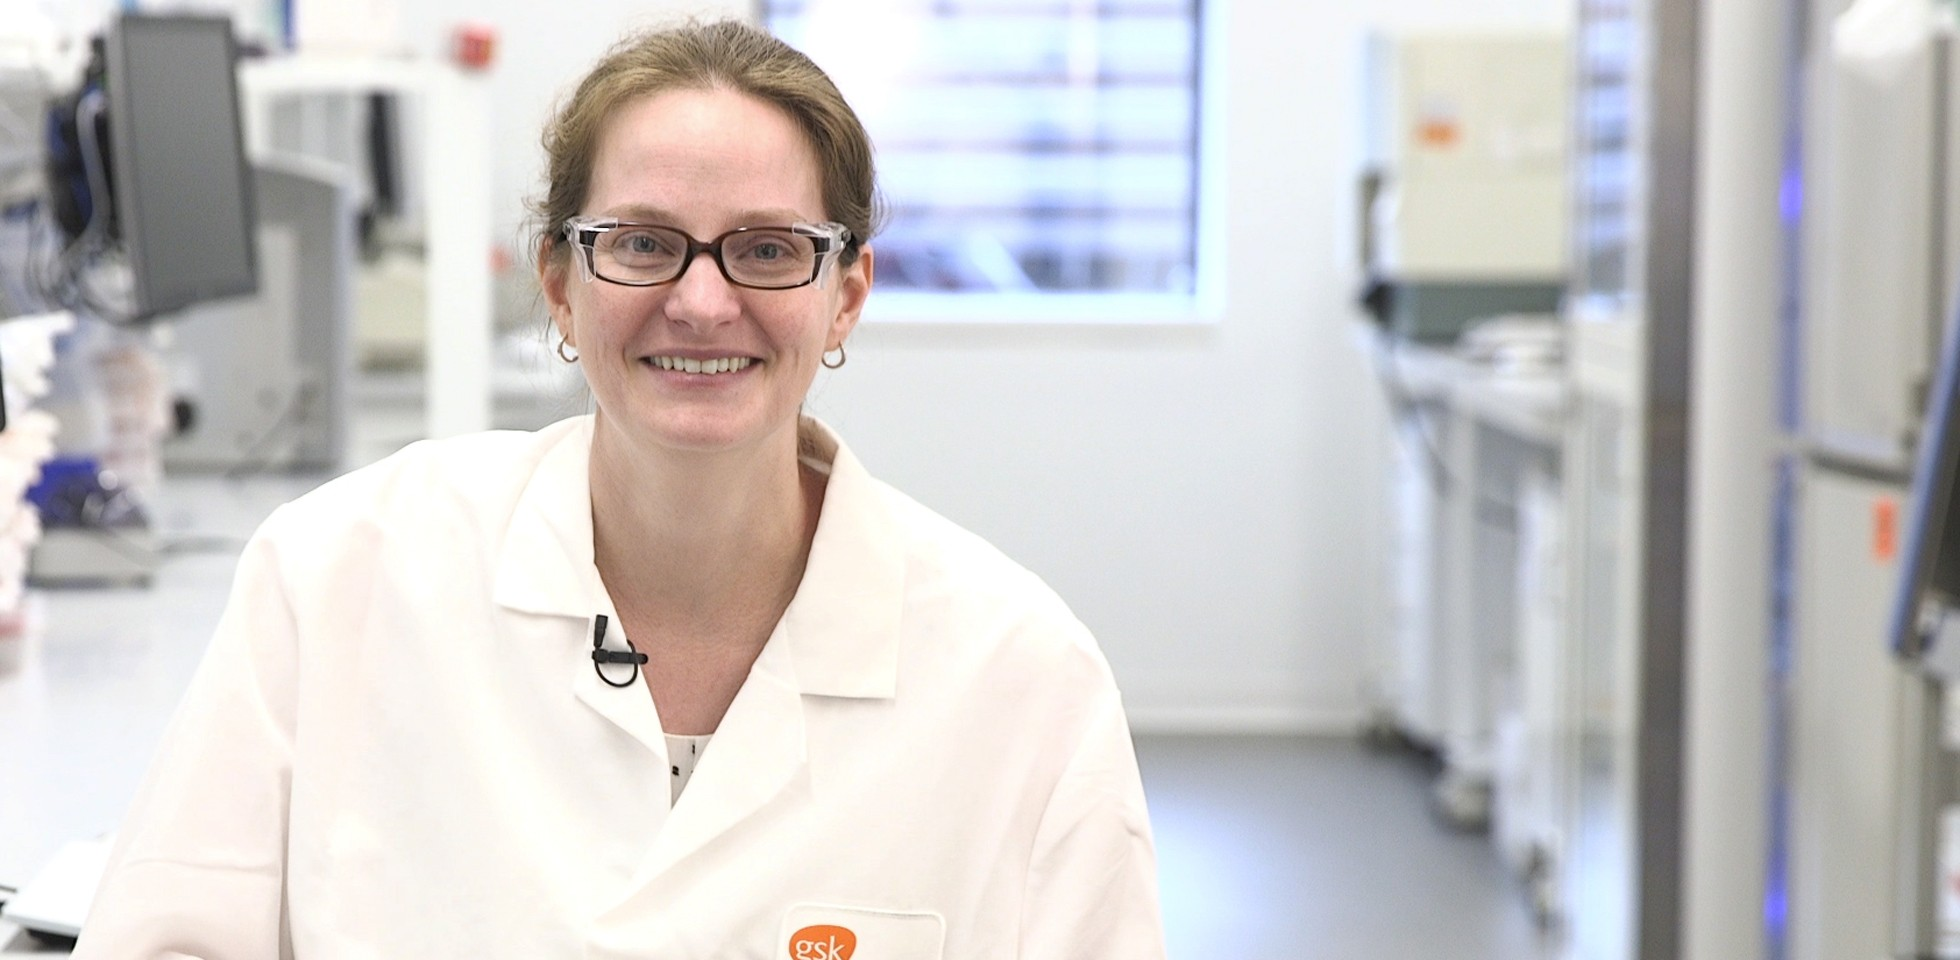 Melissa Pappalardi, Scientific Leader Oncology - GlaxoSmithKline Careers